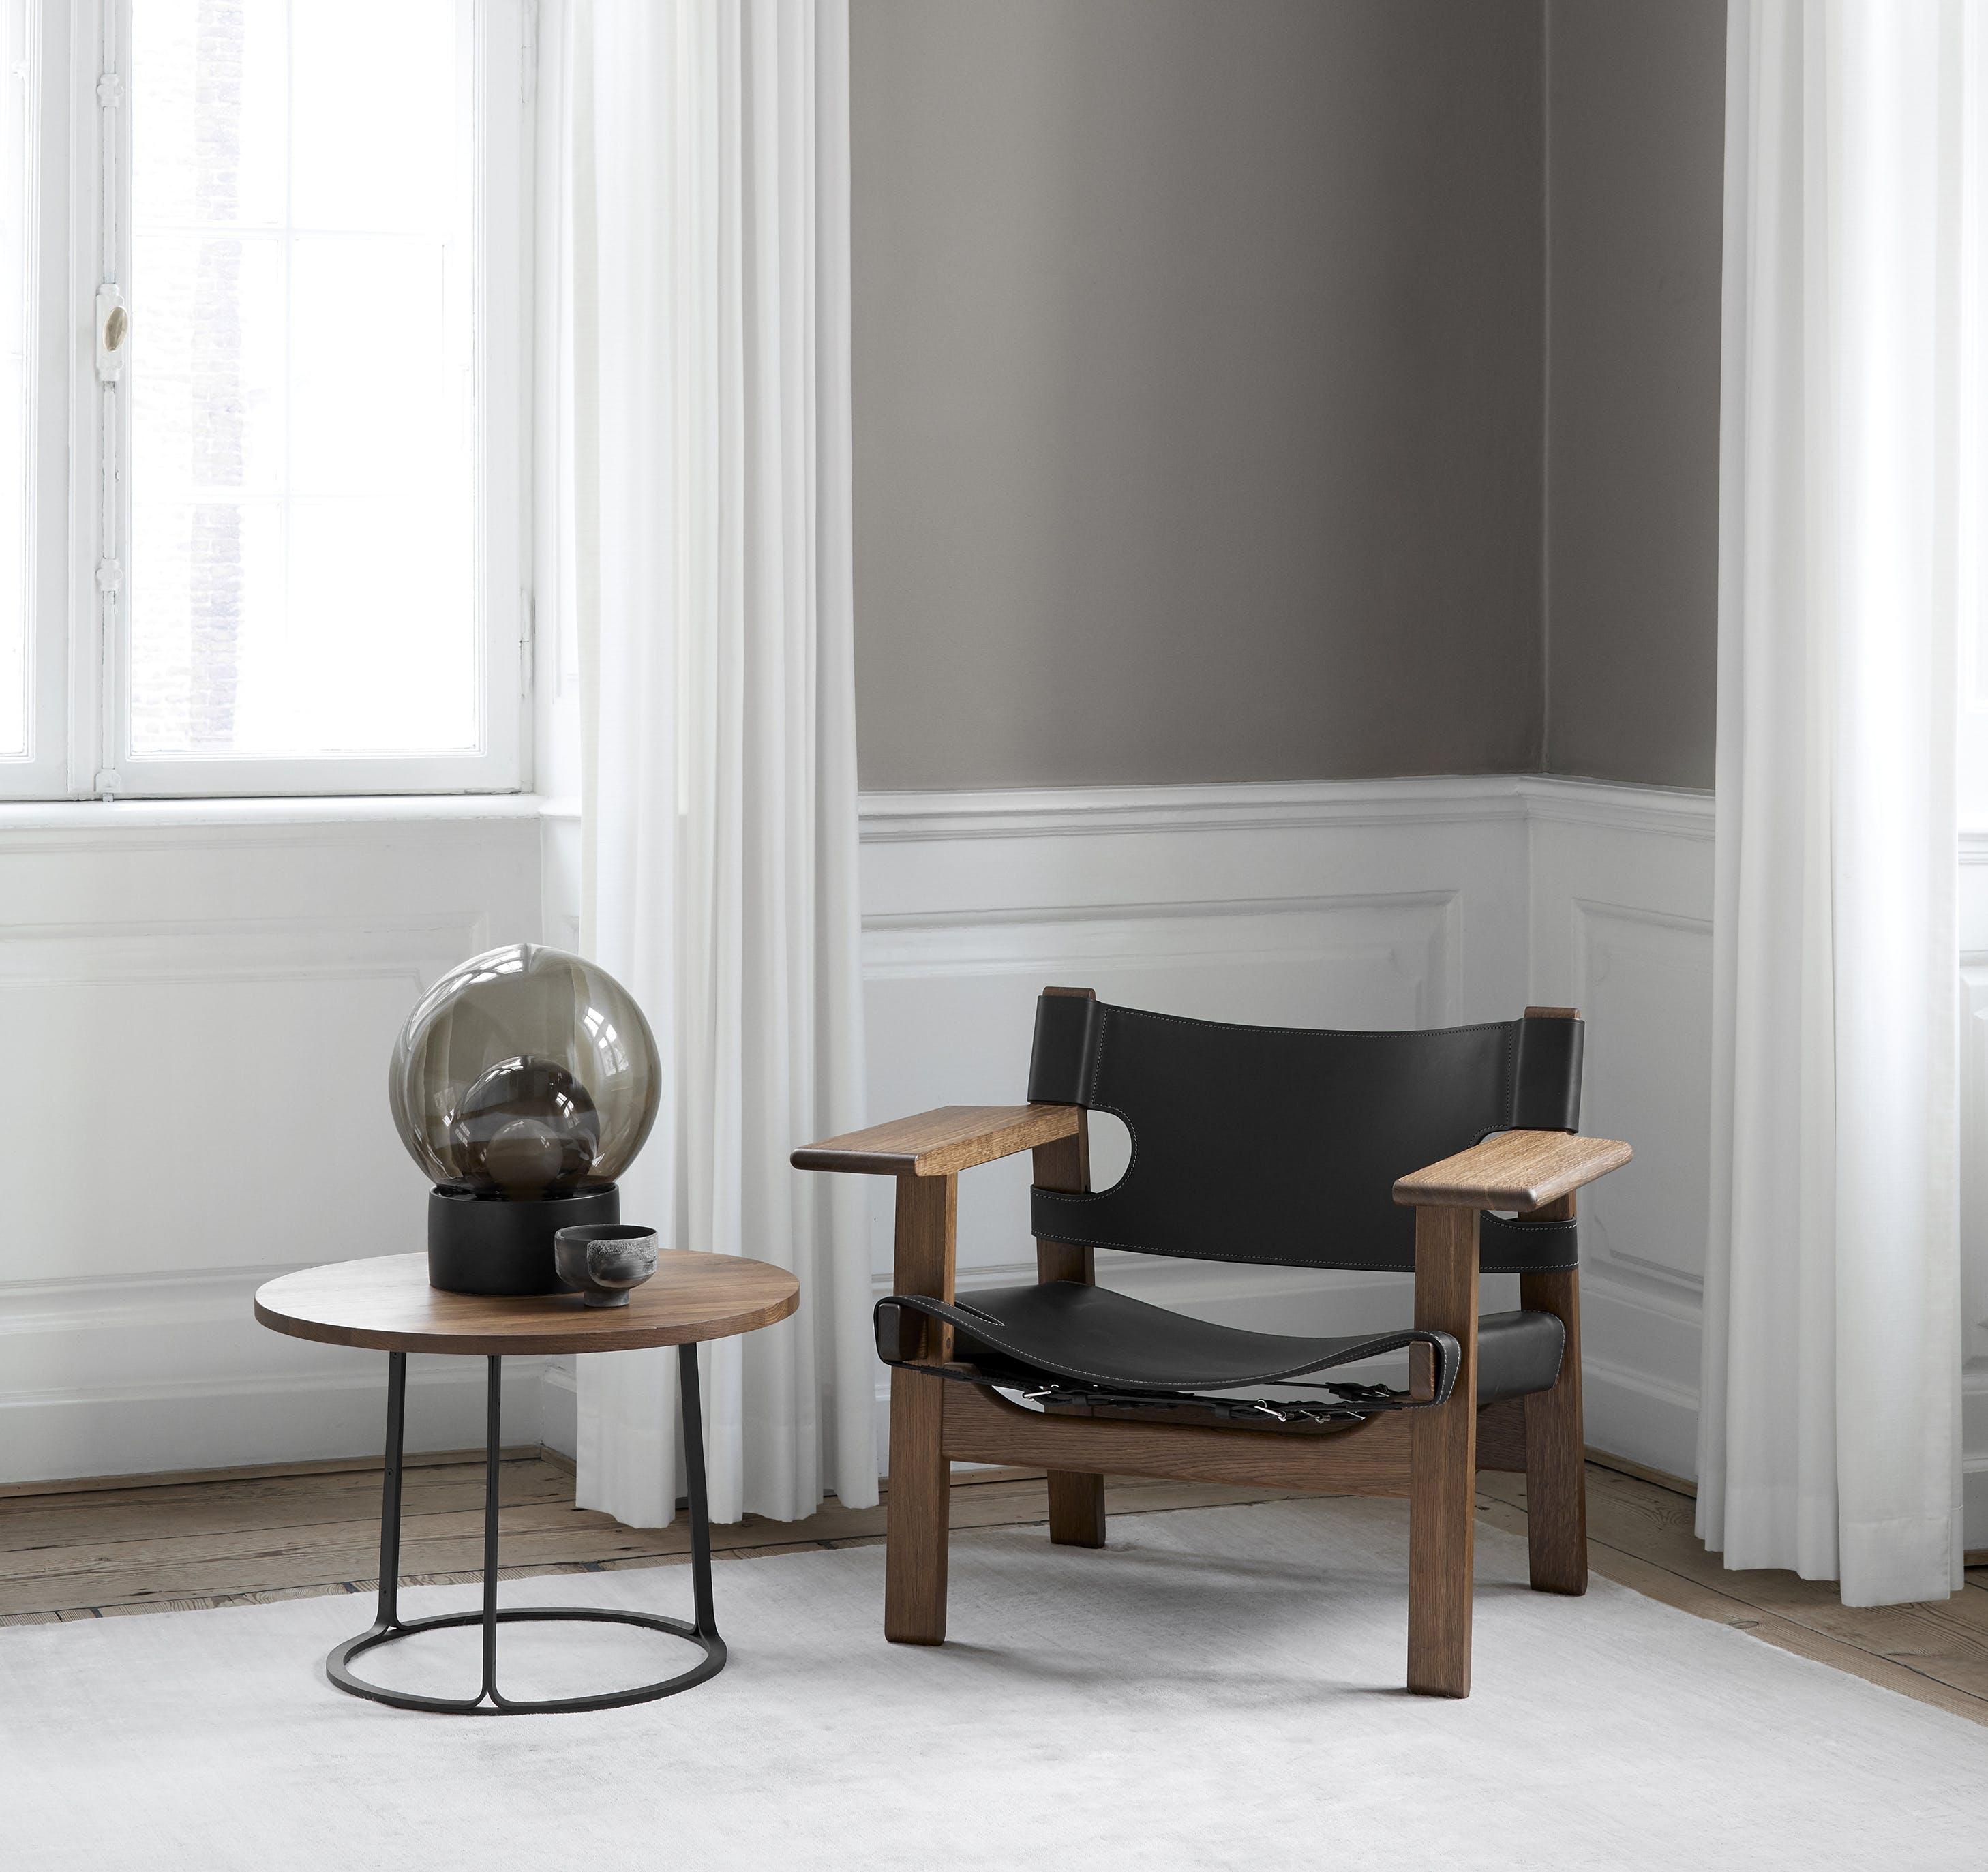 Fredericia Furniture Barbry Table Insitu Single Haute Living